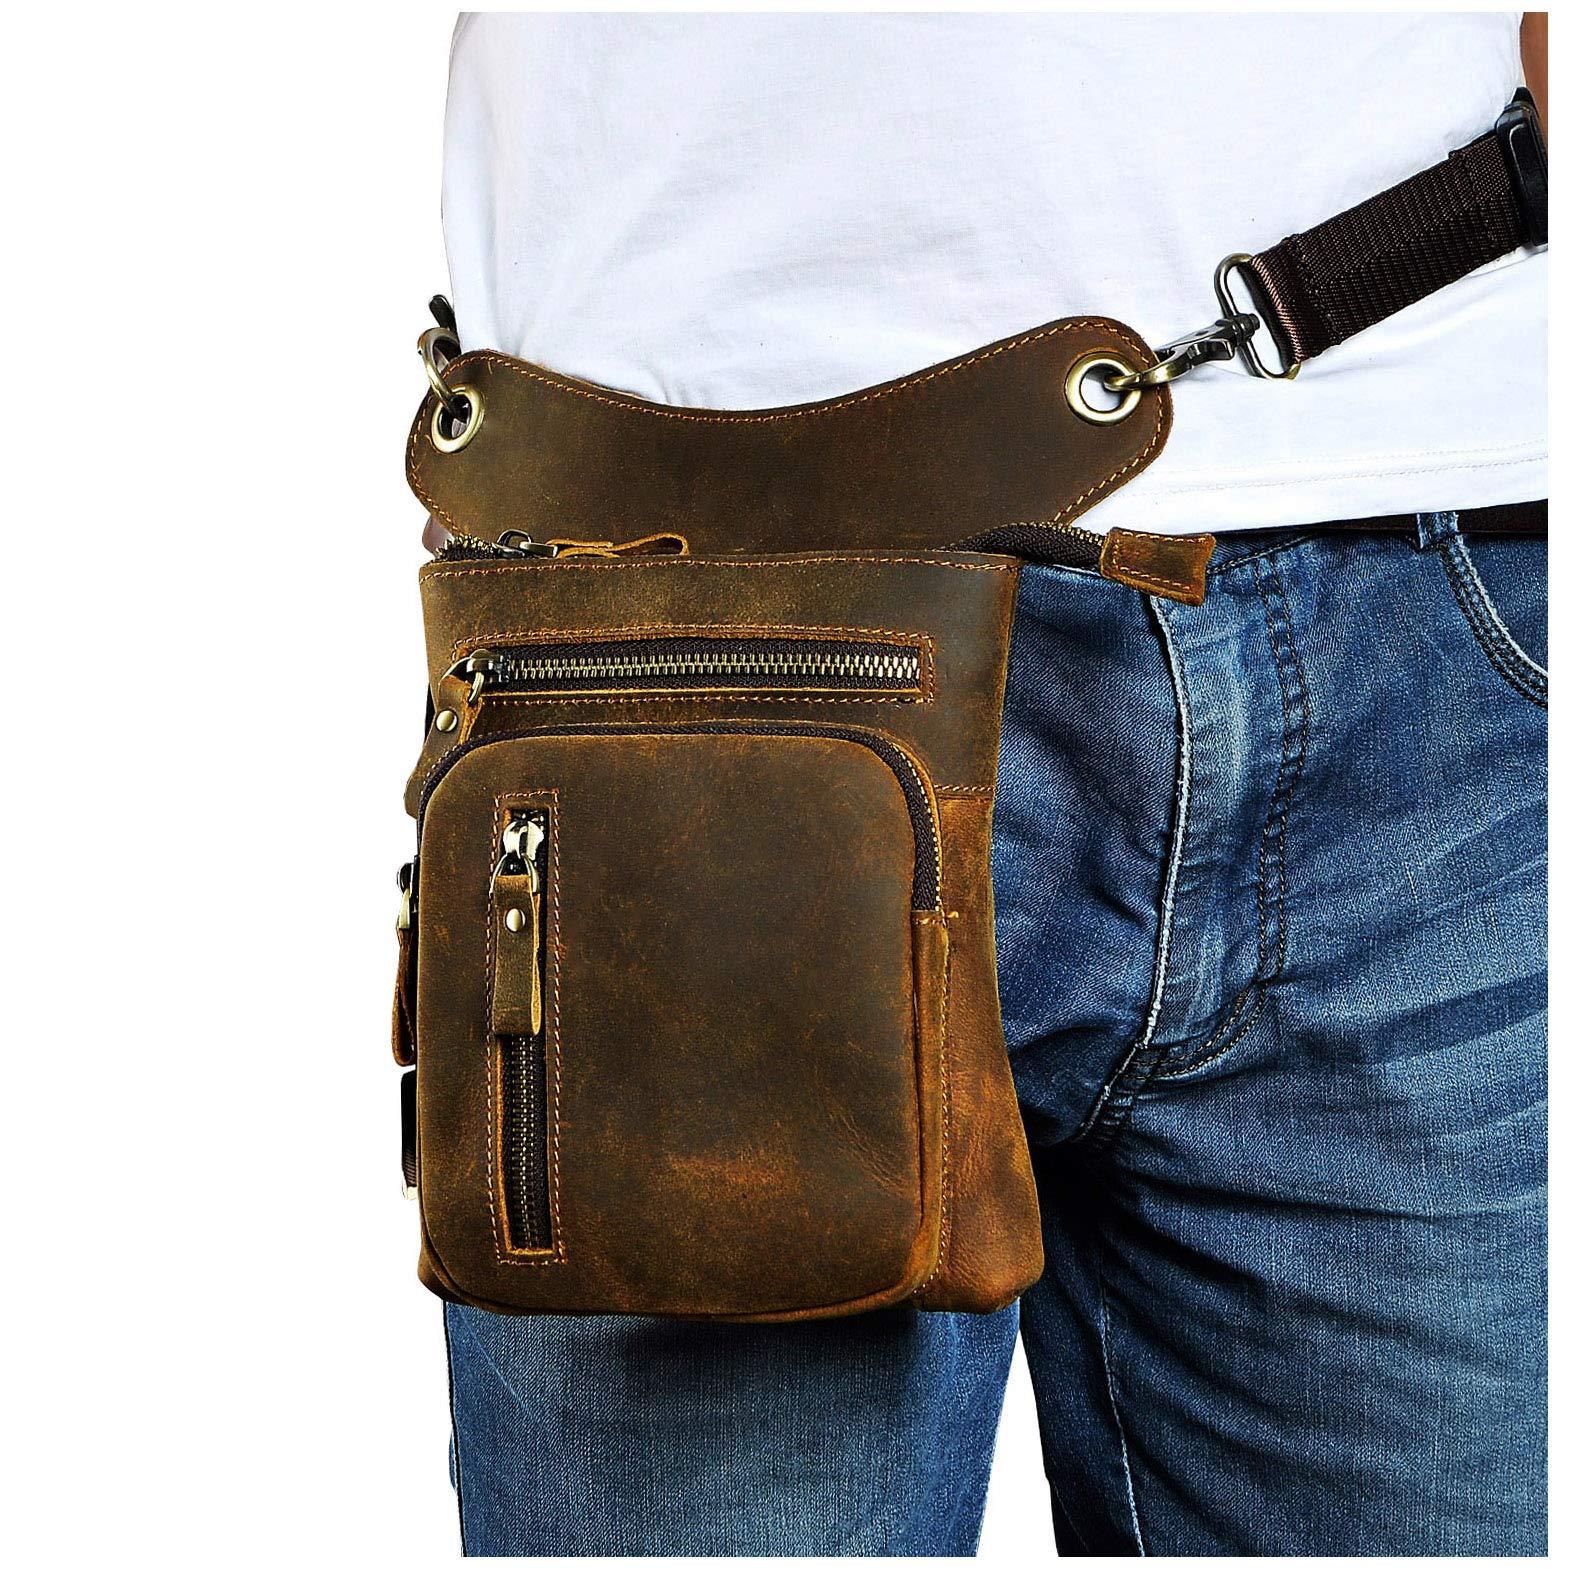 Le'aokuu Mens Genuine Leather Motorcycle Waist Pack Drop Leg Cross Over Bag (The 211-11 dark brown)